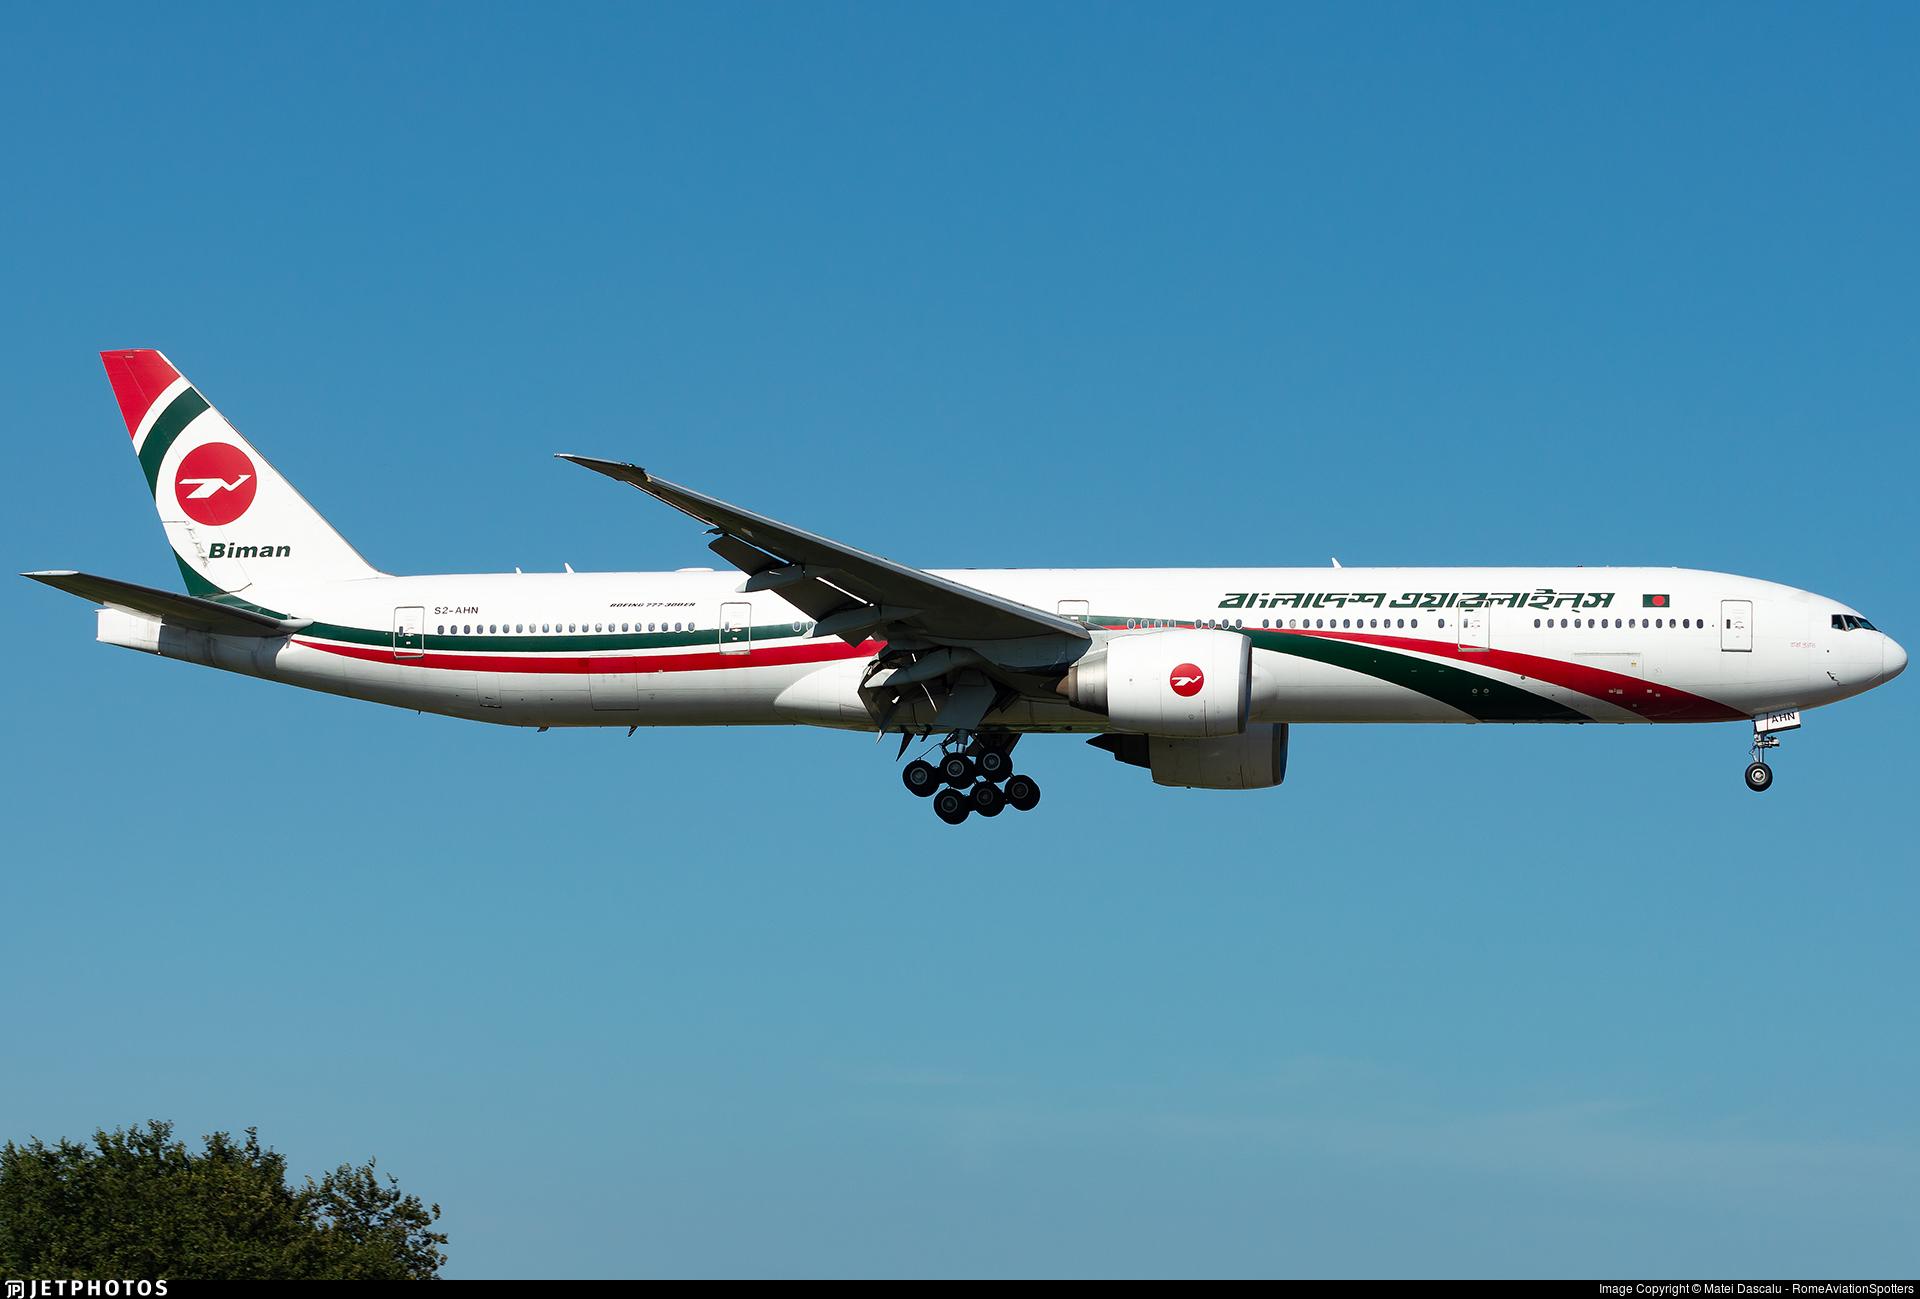 S2-AHN - Boeing 777-3E9ER - Biman Bangladesh Airlines